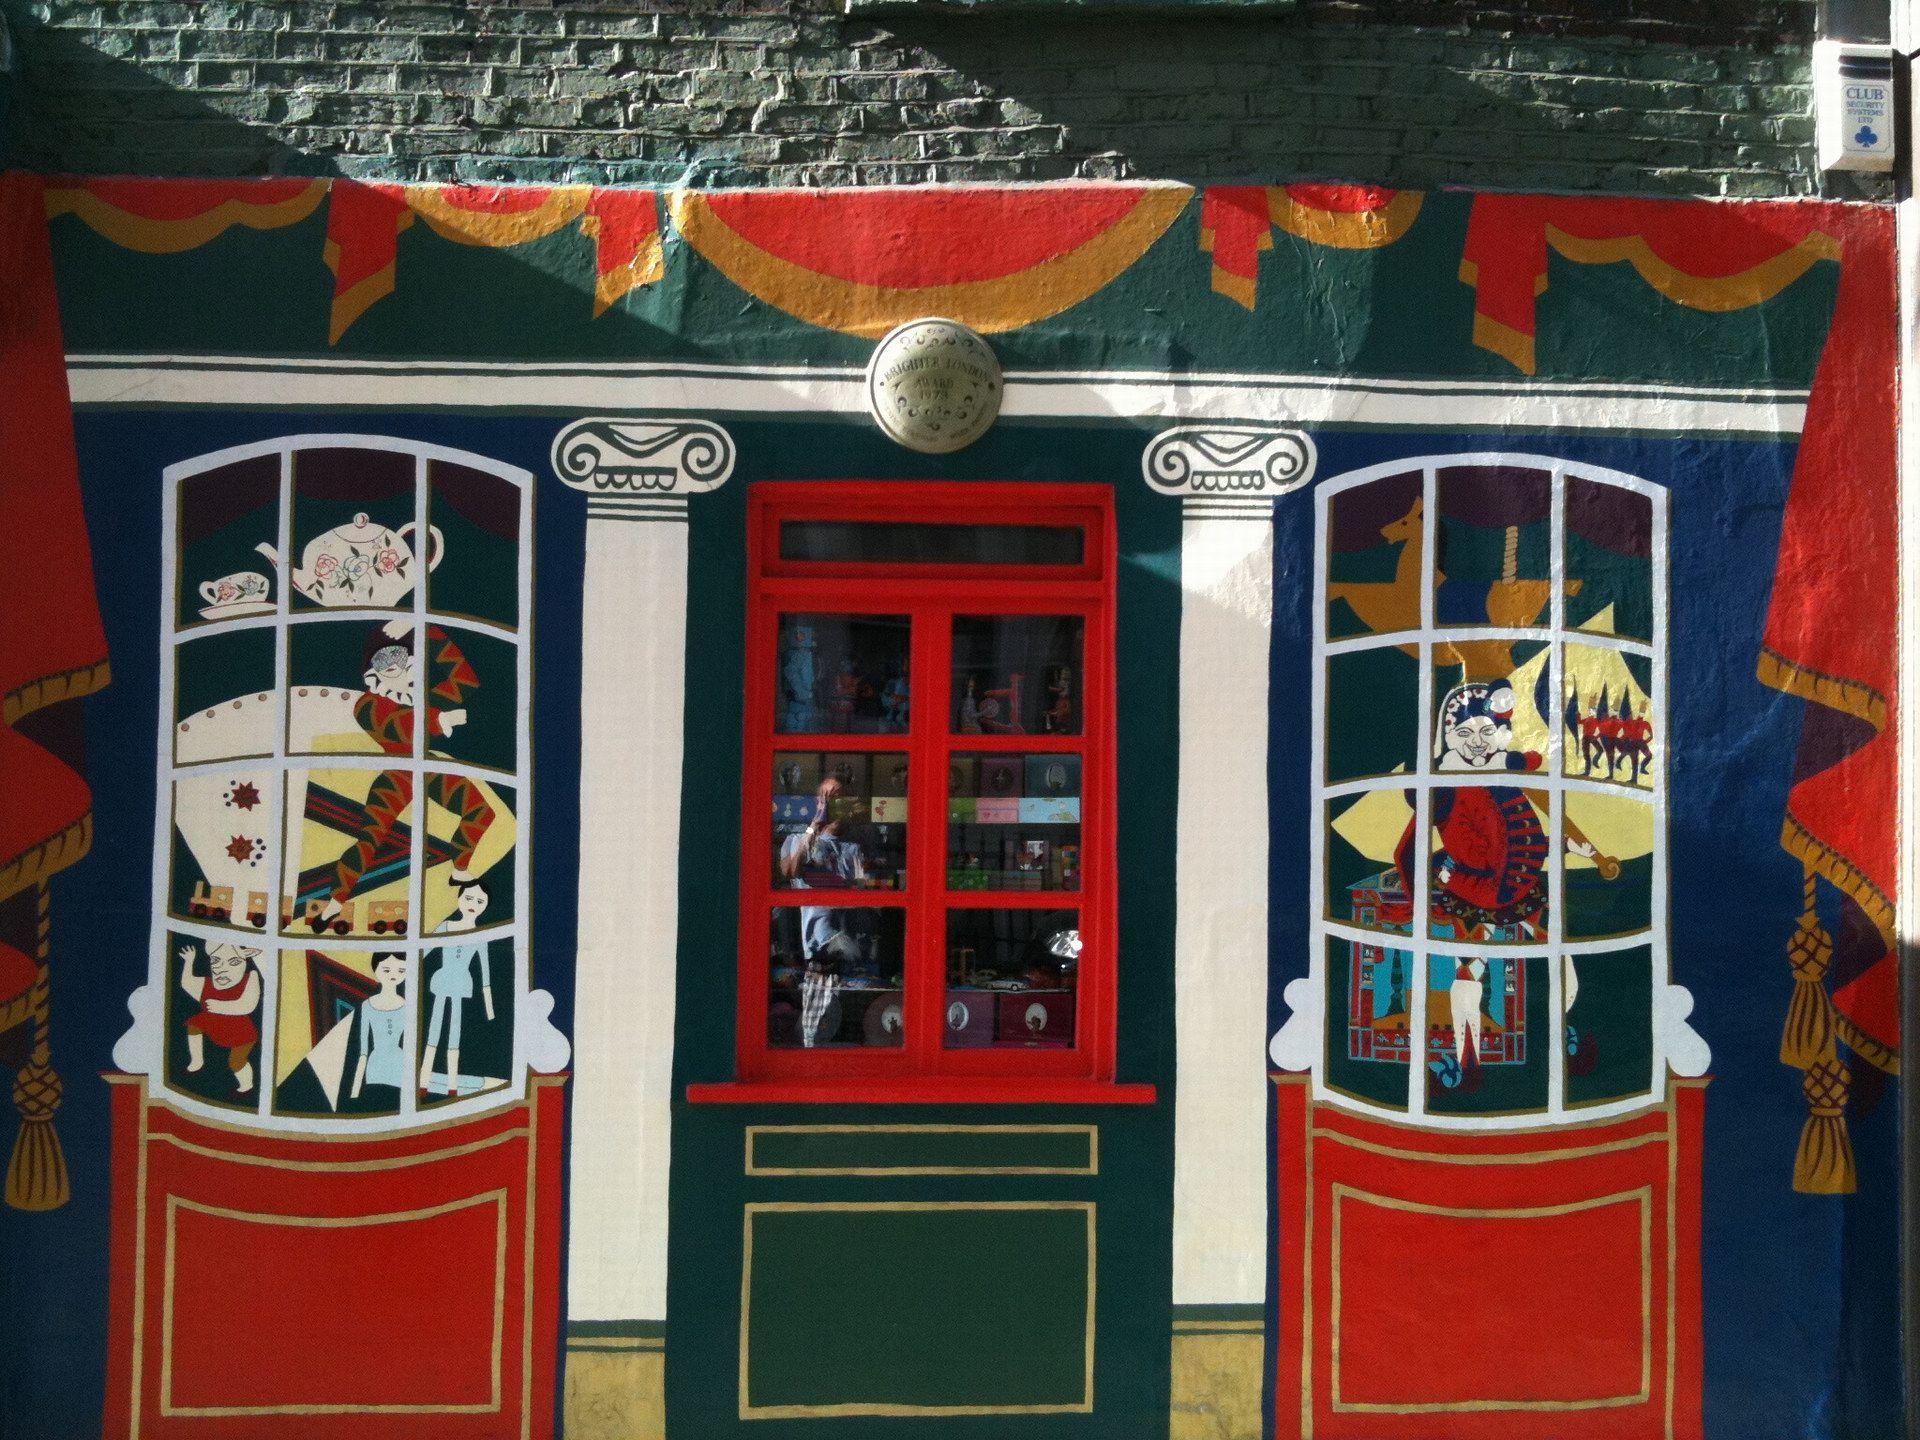 Pollock's Toy Museum, London